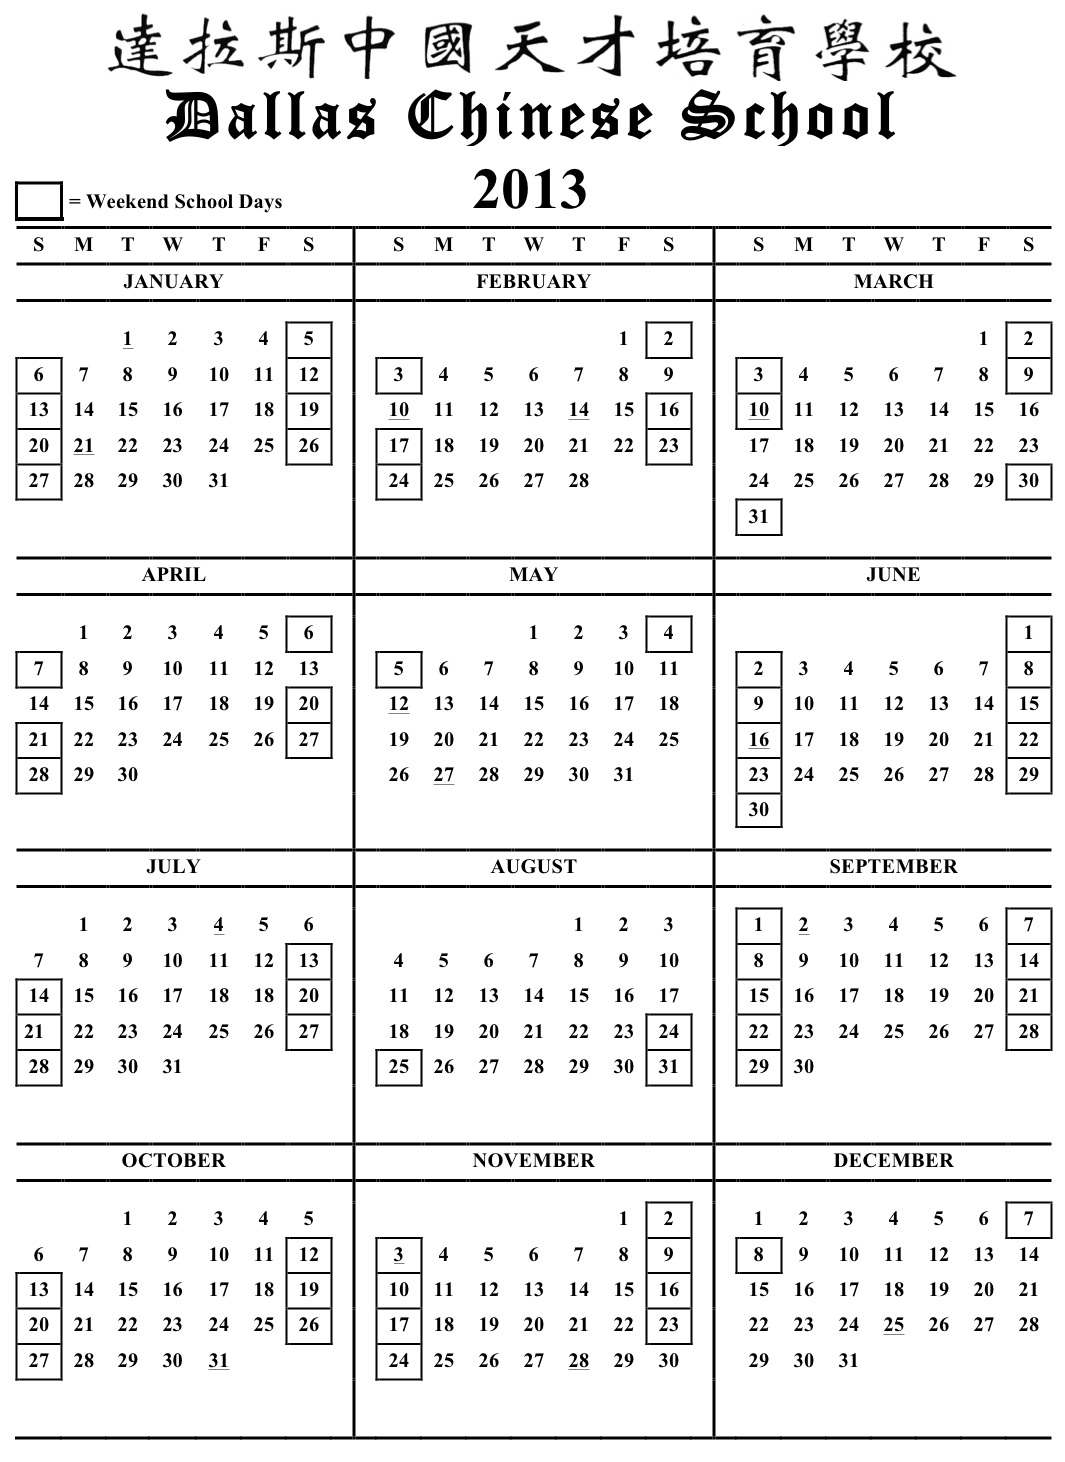 new 2013 calendar released  download 2013 spring registration form and register now   u2013 dallas